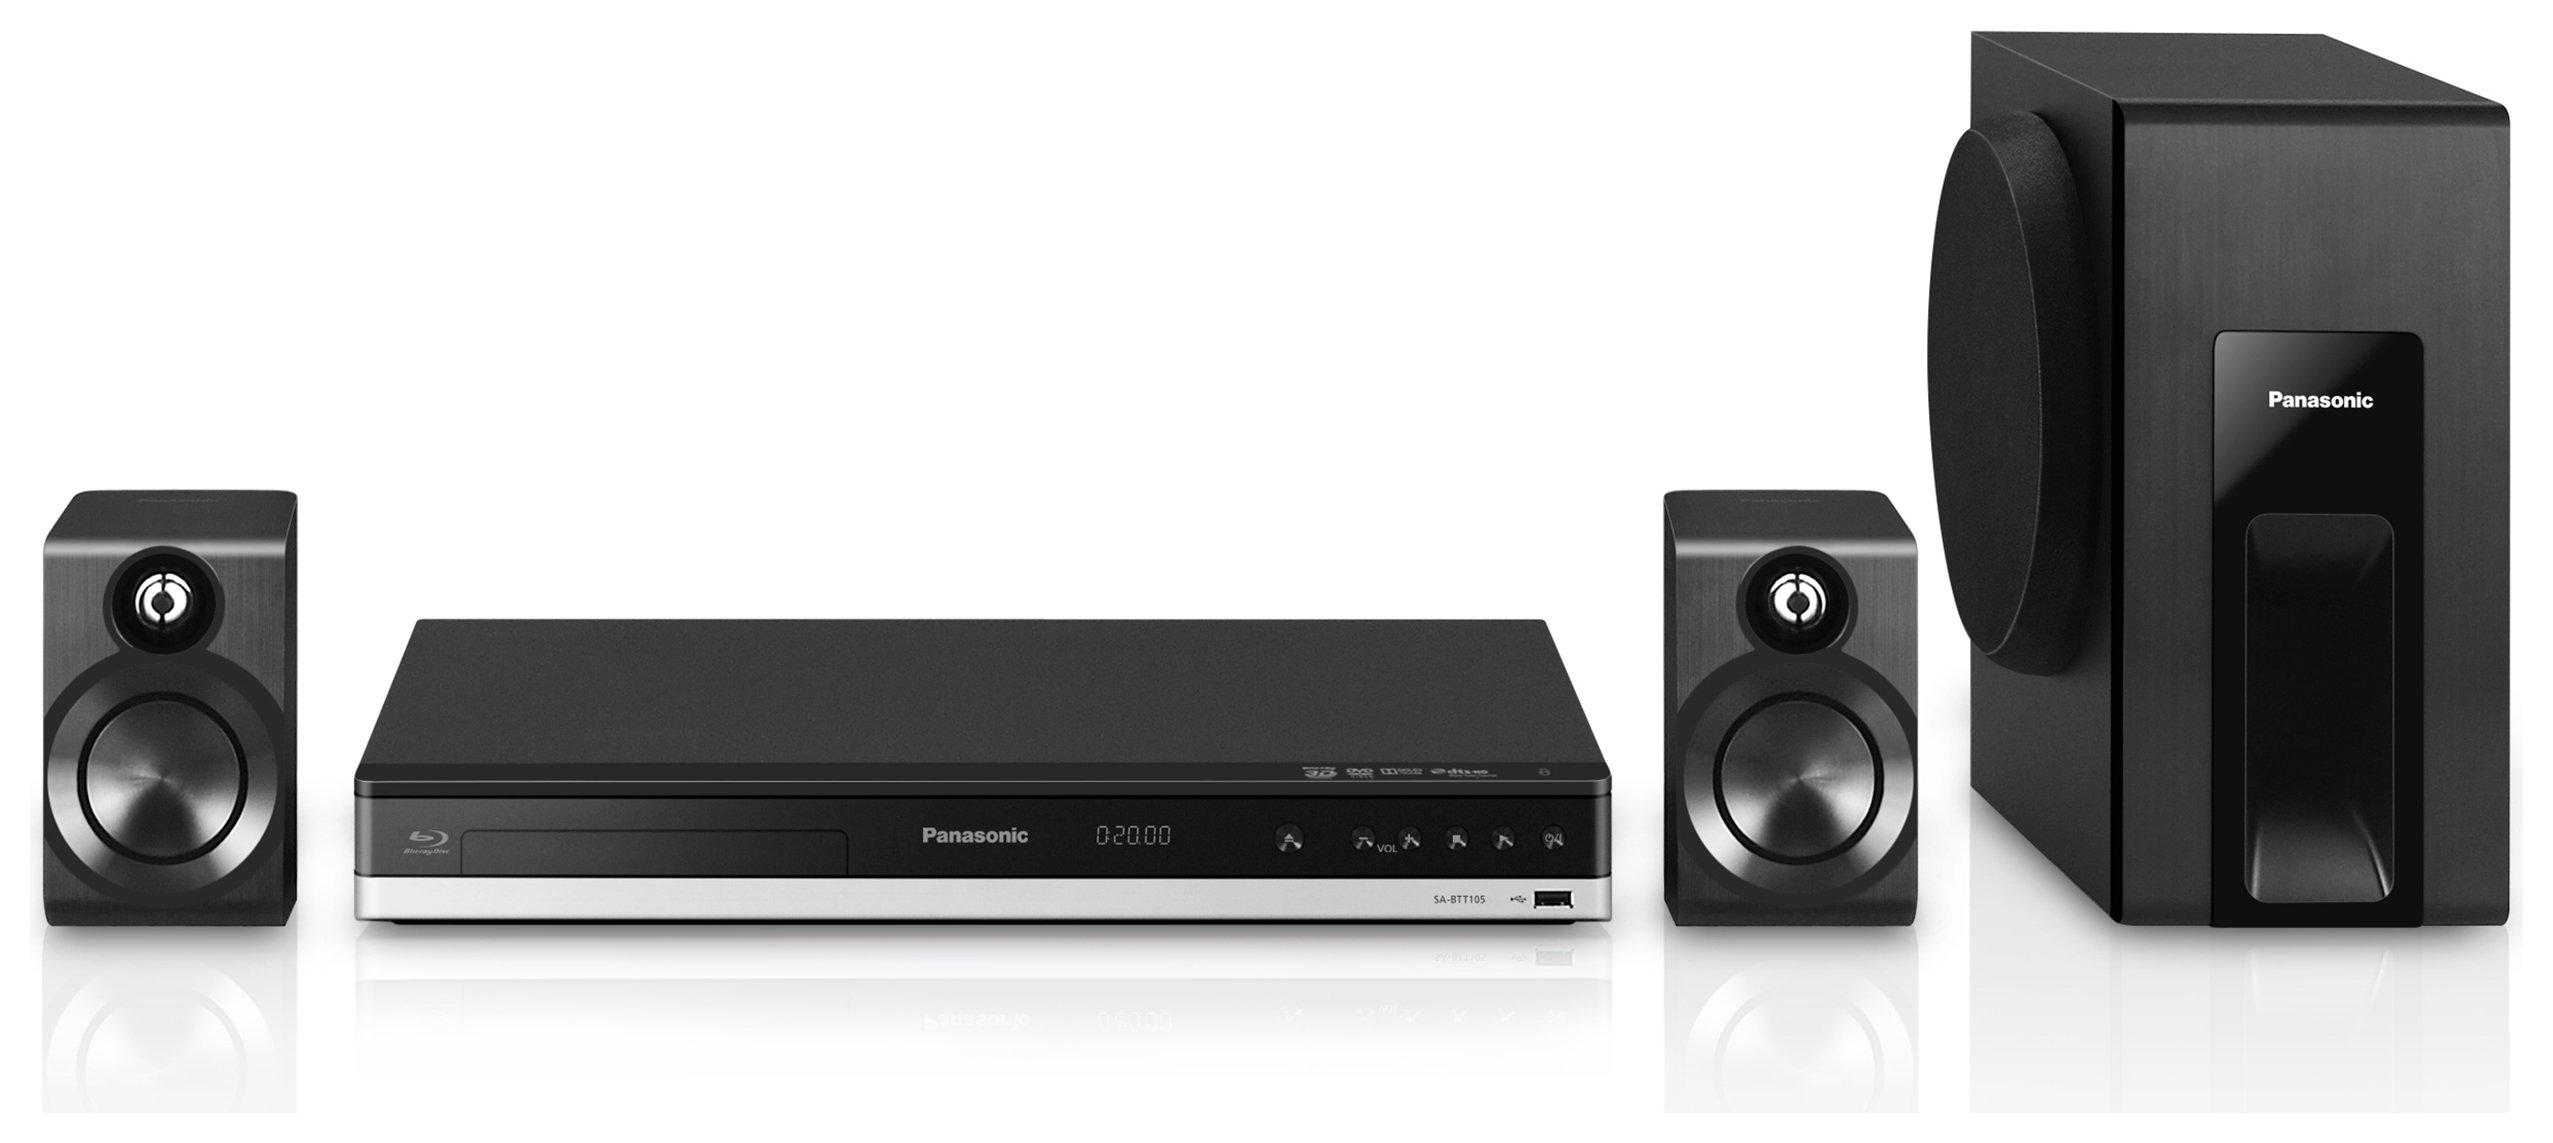 Panasonic - SCBTT105EB9 300W 2.1 Smart 4K Home Cinema System. - Black